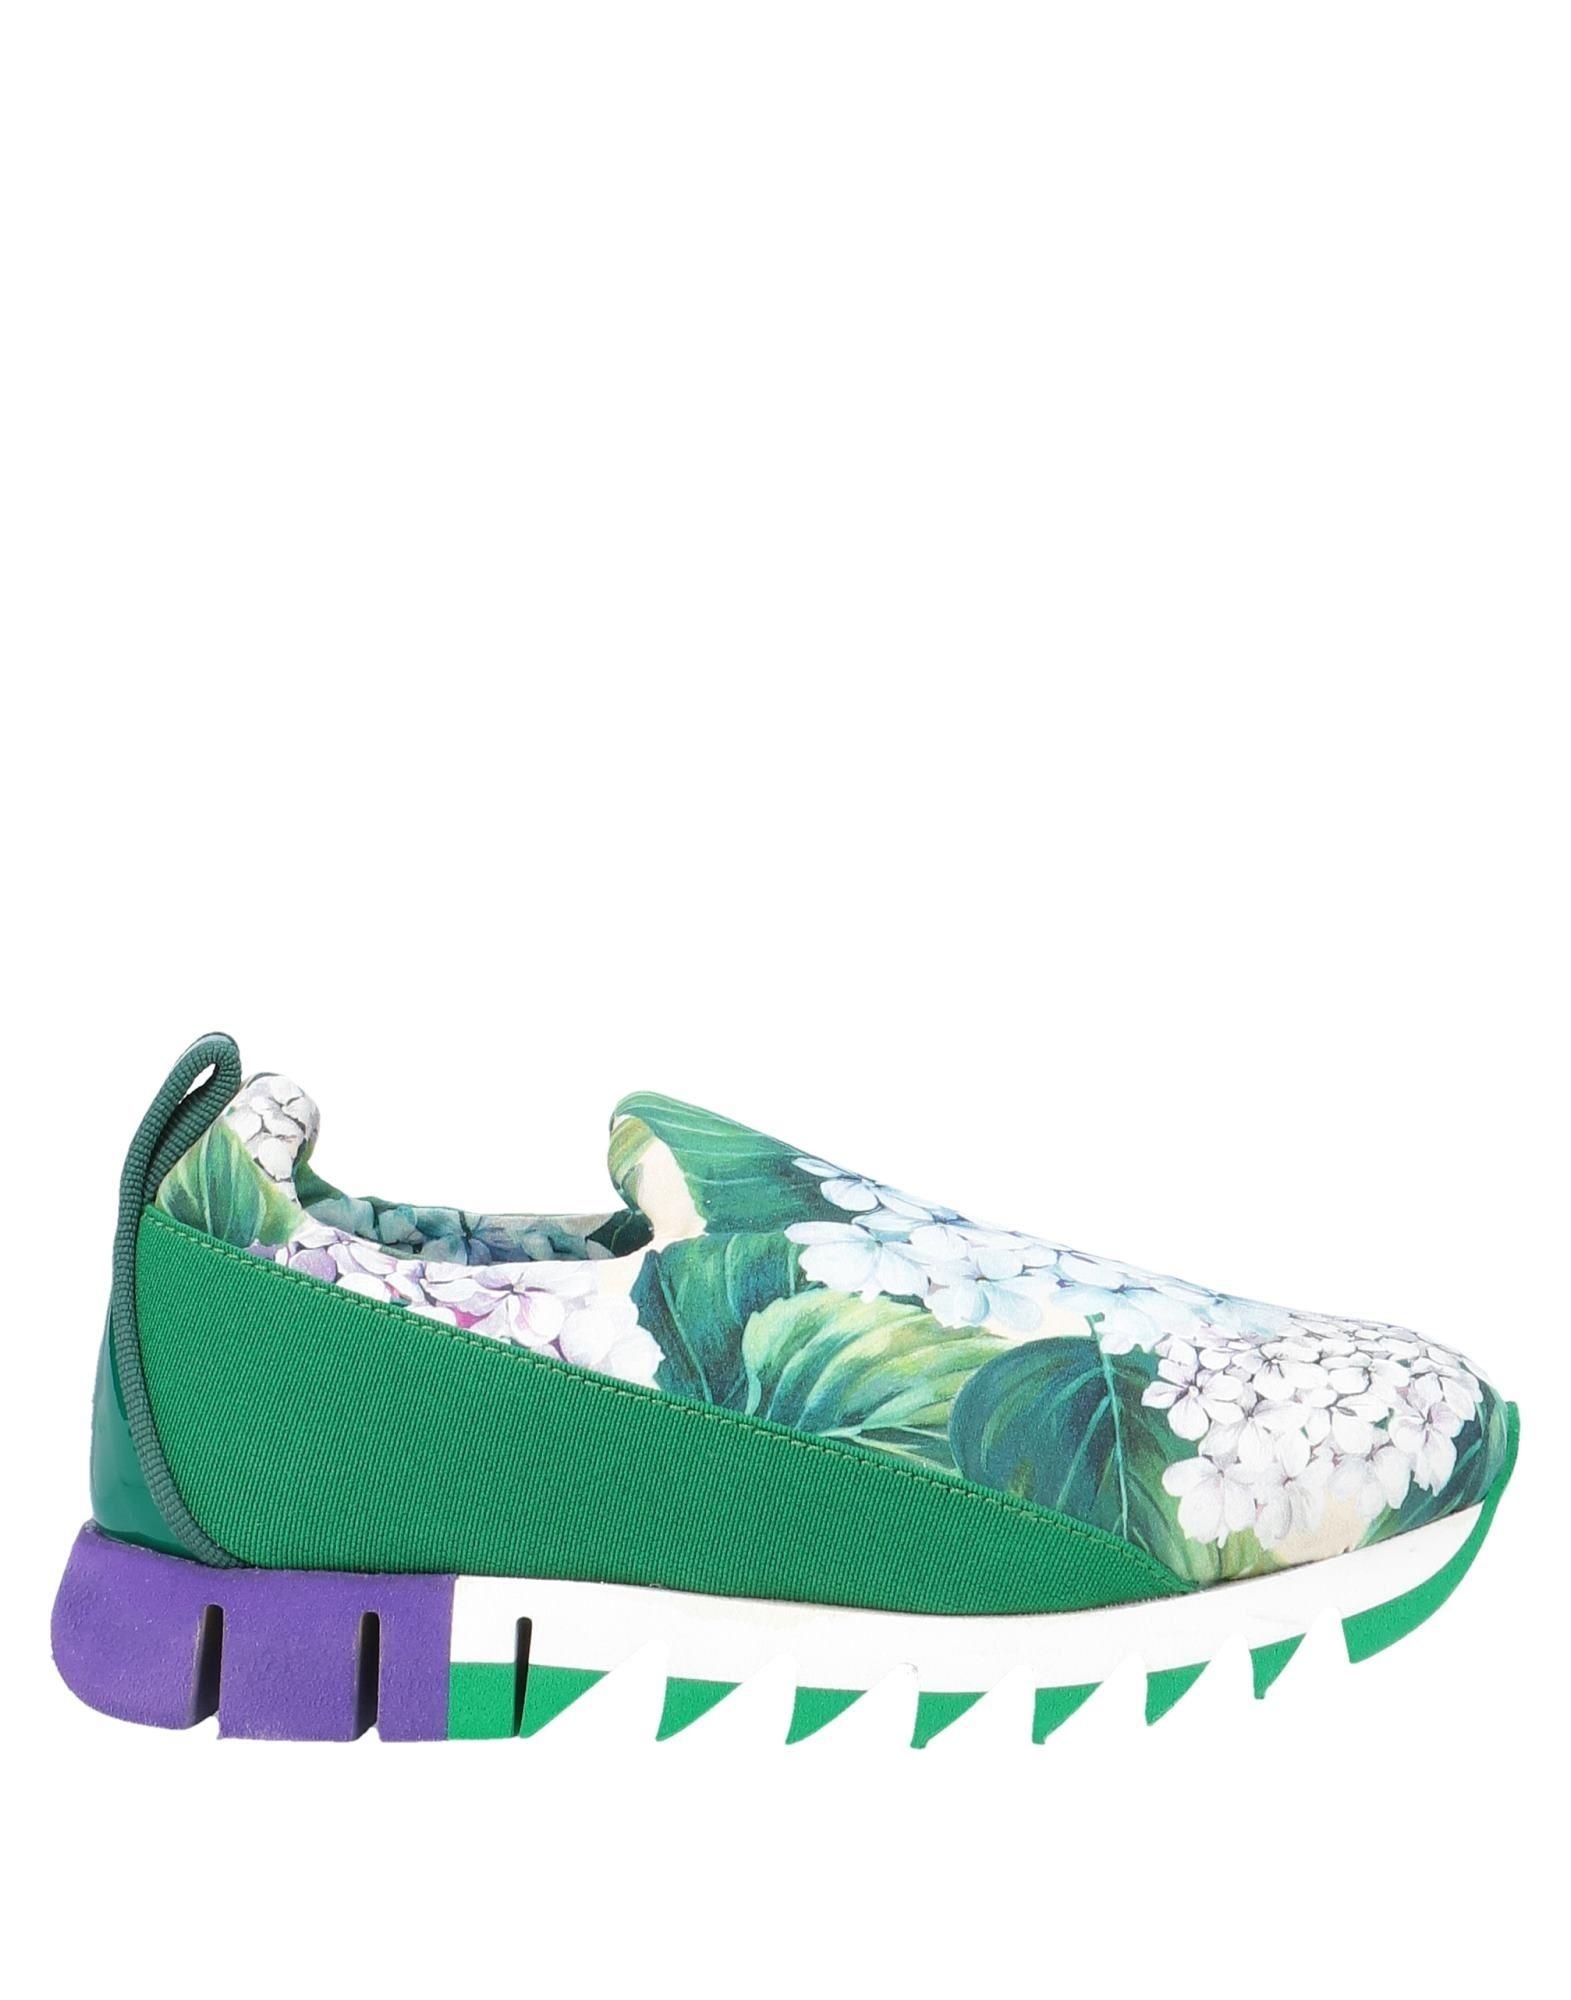 DOLCE & GABBANA | DOLCE & GABBANA Low-Tops & Sneakers 11717955 | Goxip